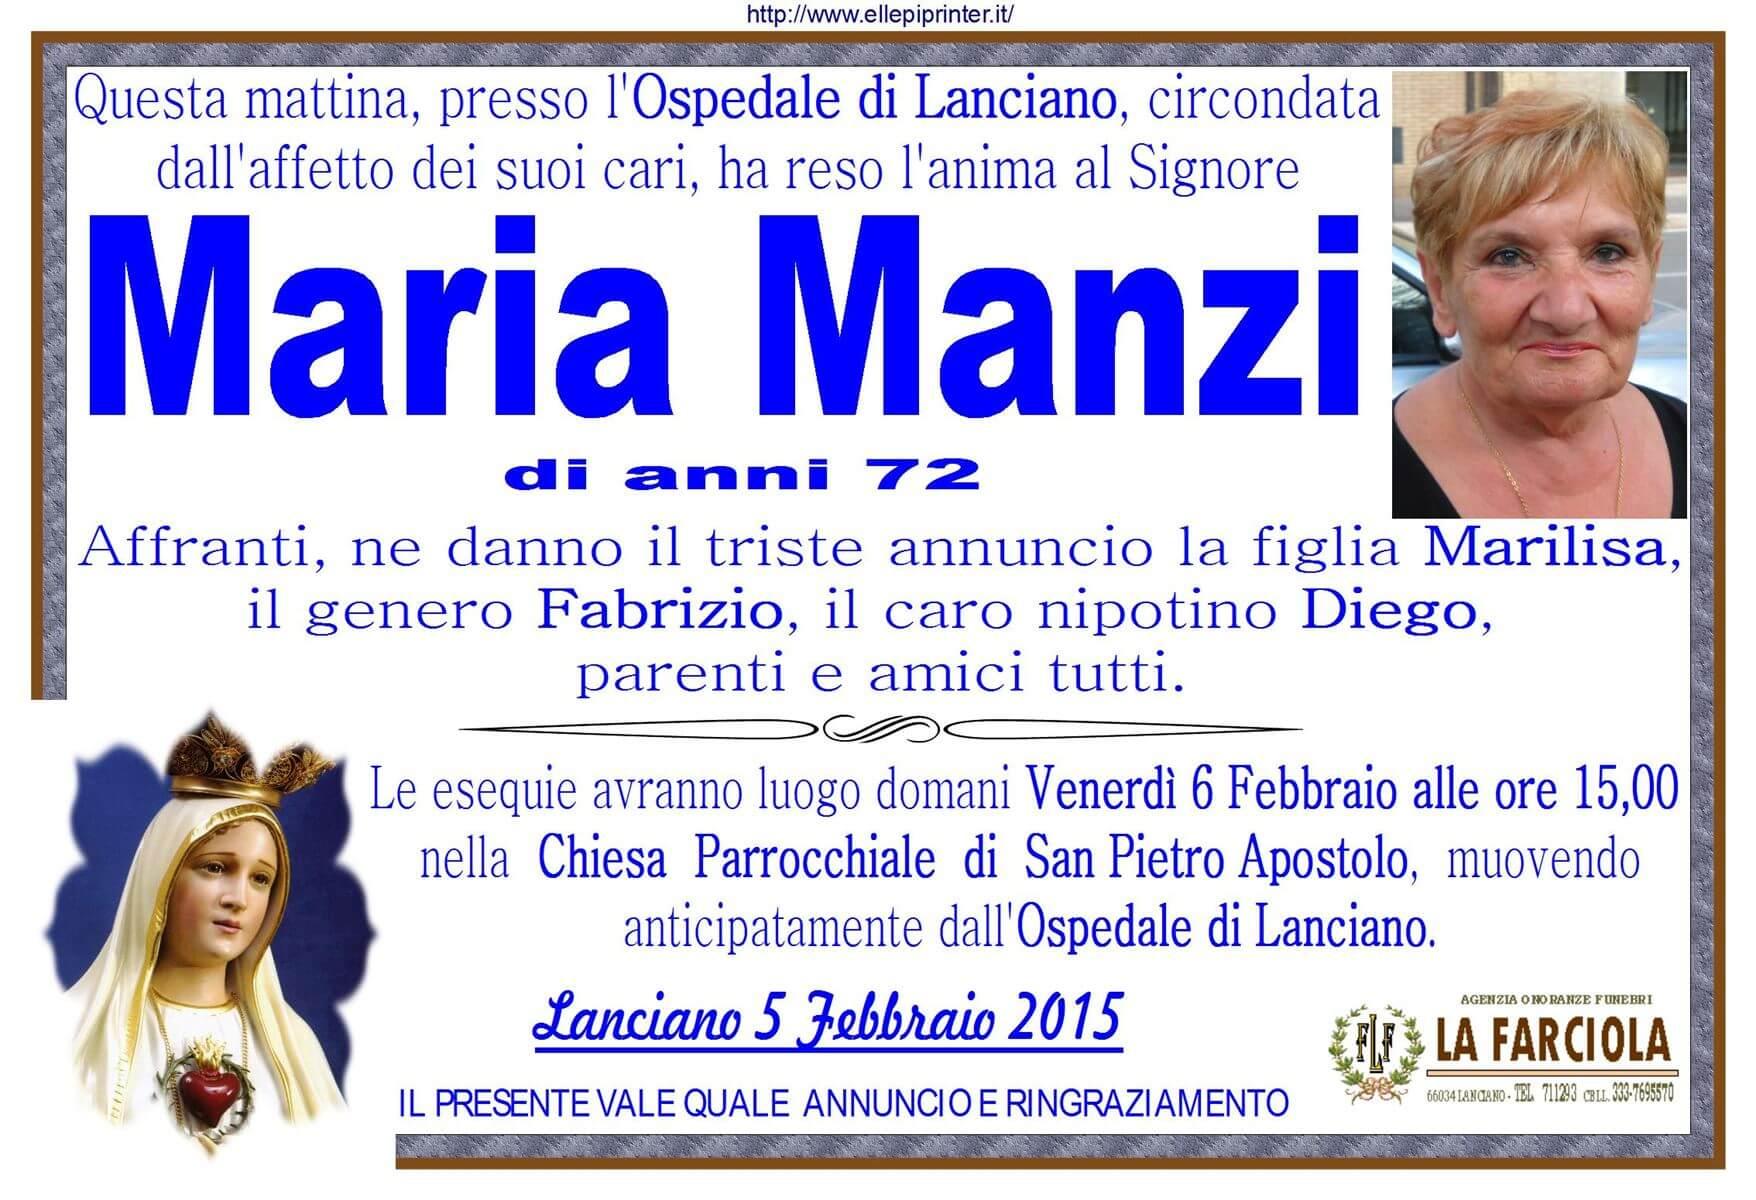 MANIFESTO MANZI MARIA